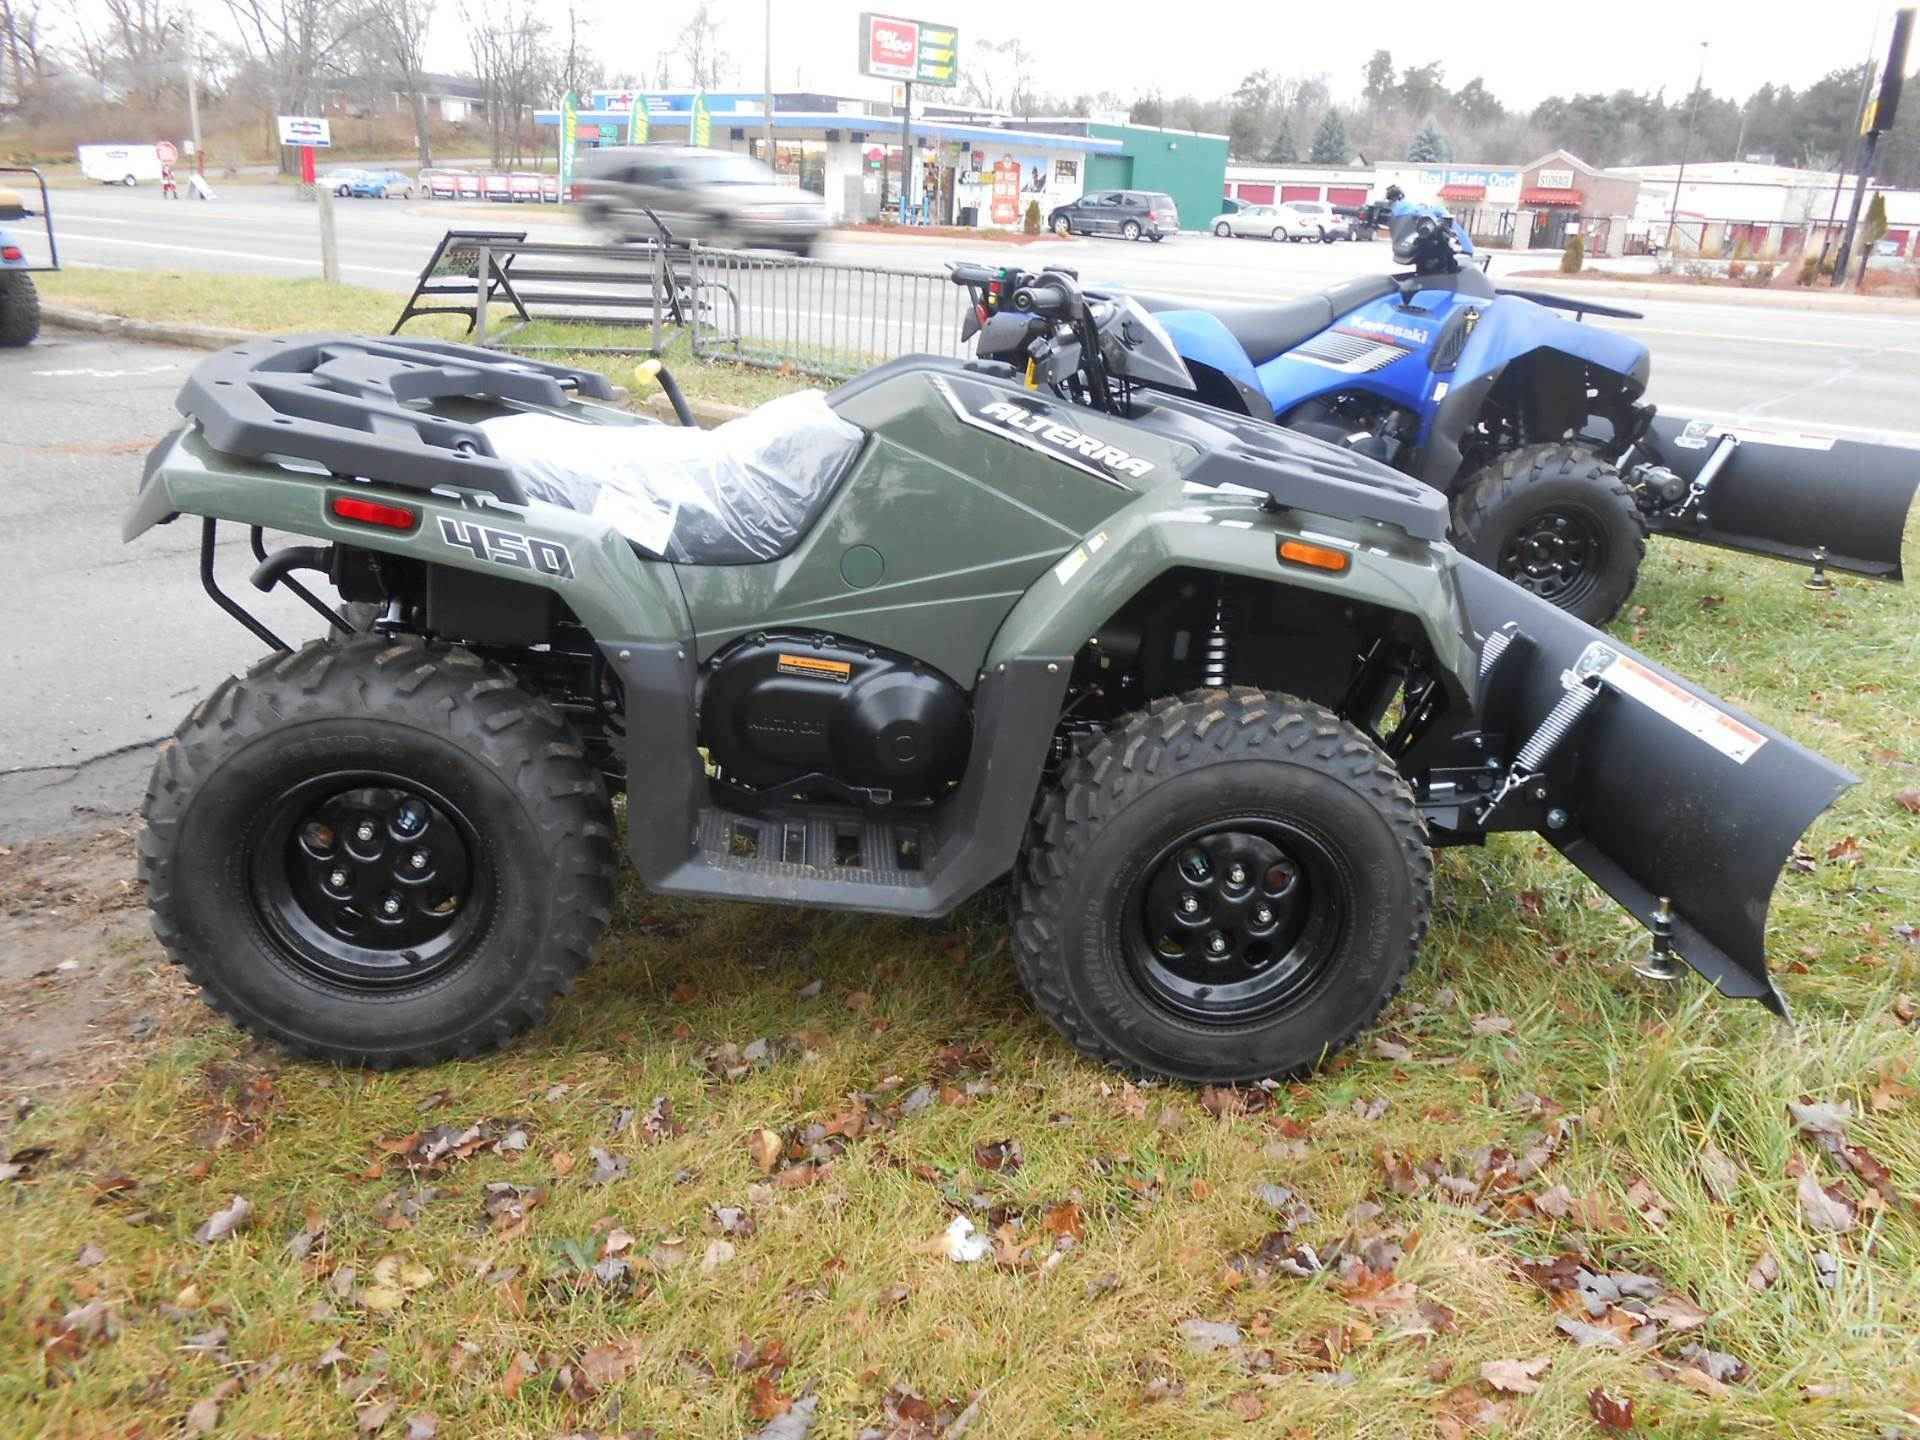 New 2016 Arctic Cat Alterra 450 ATVs For Sale in Michigan. Showroom Model !  PLOW